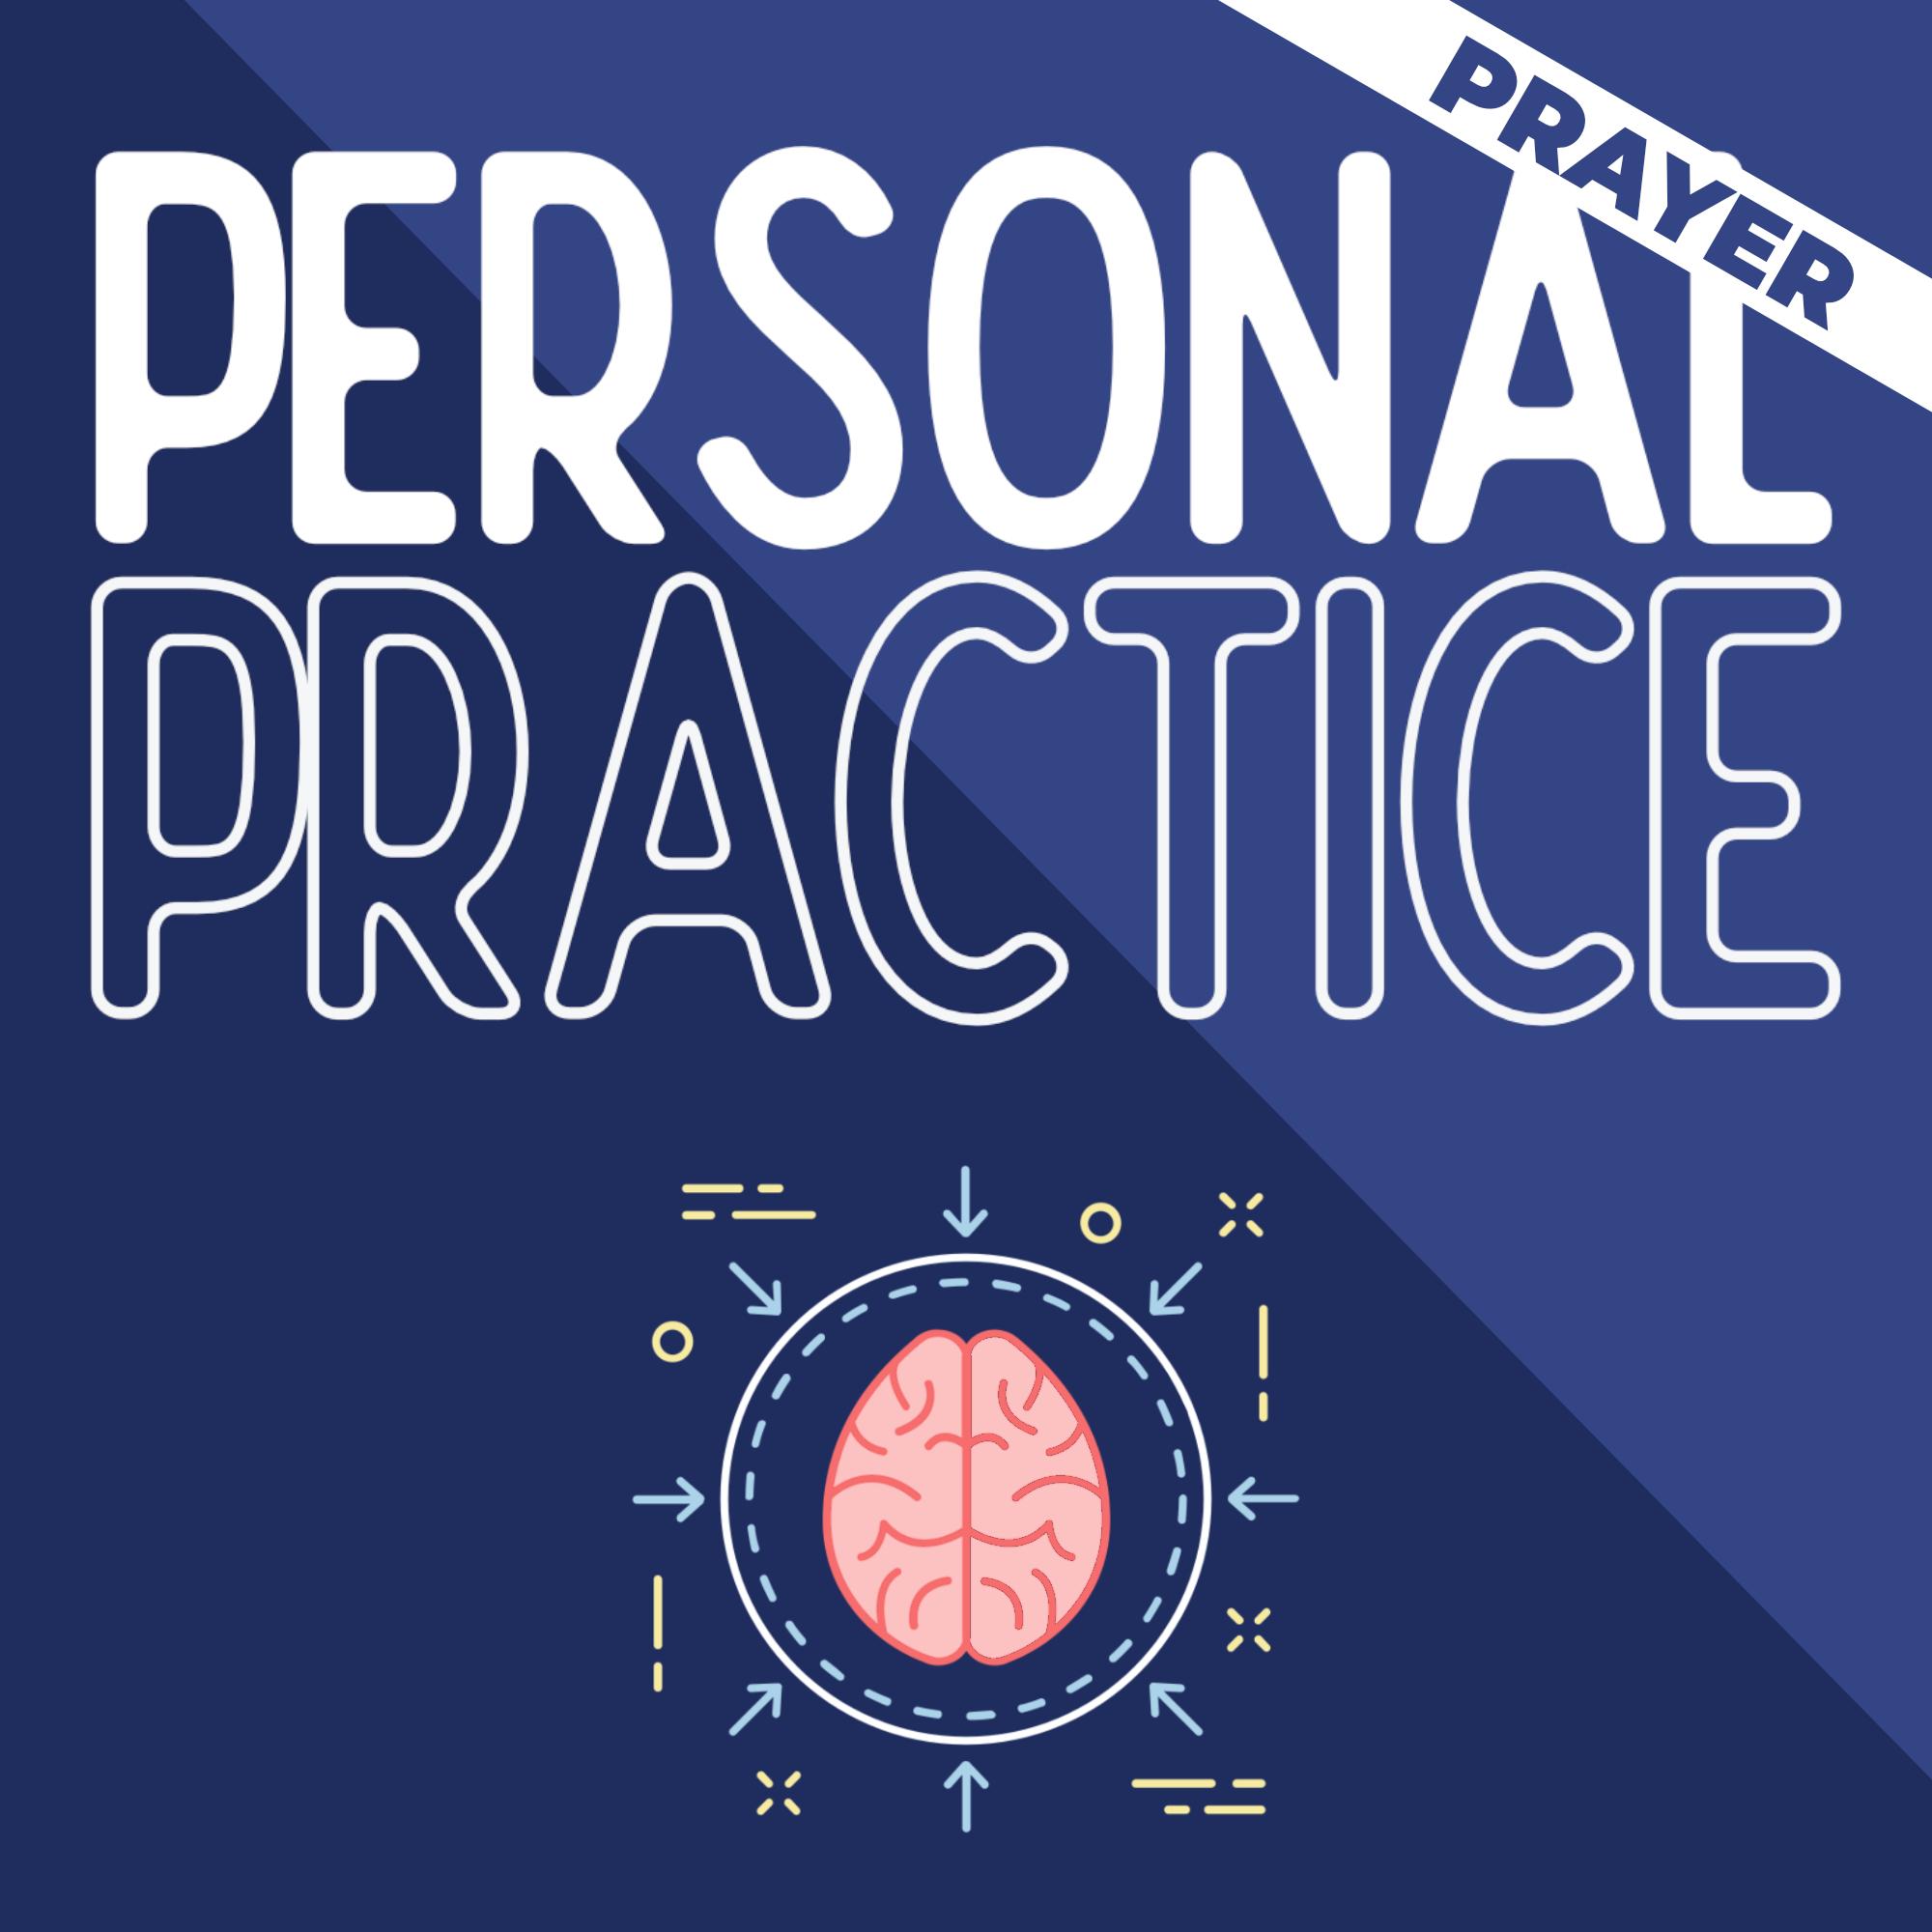 3 personal practice square prayer copy.jpg